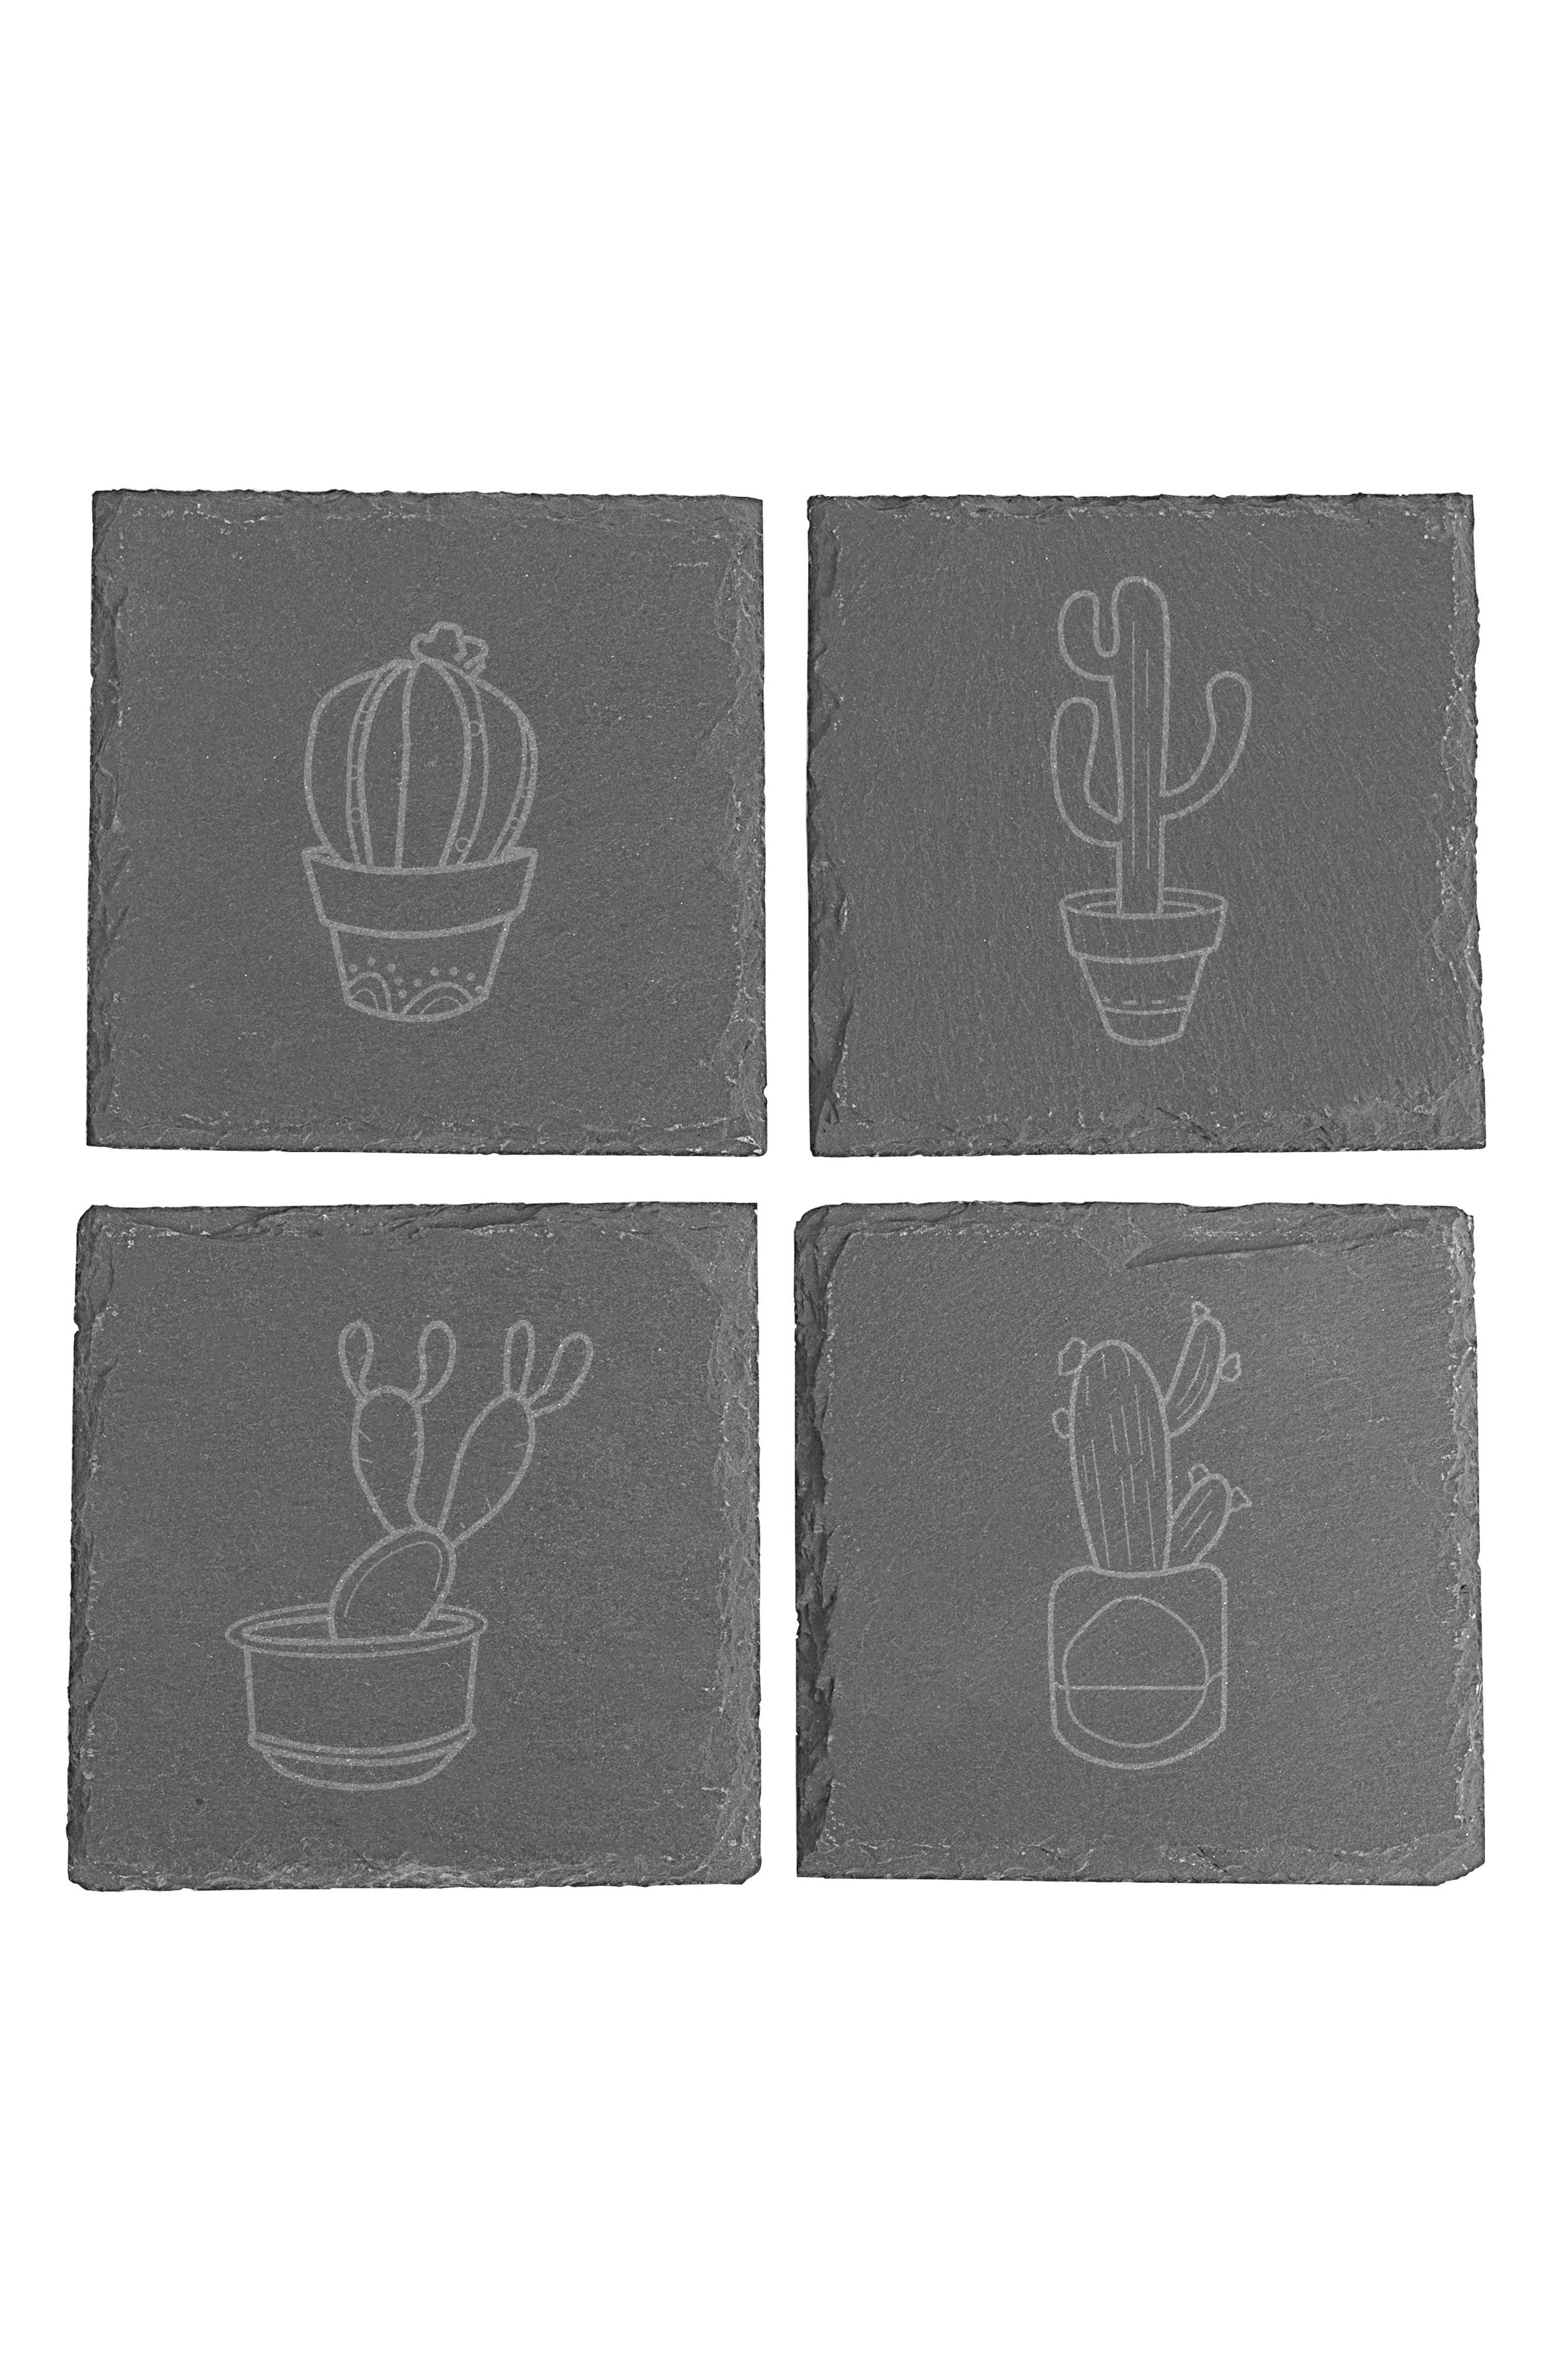 Cactus Set of 4 Coasters,                             Main thumbnail 1, color,                             Black